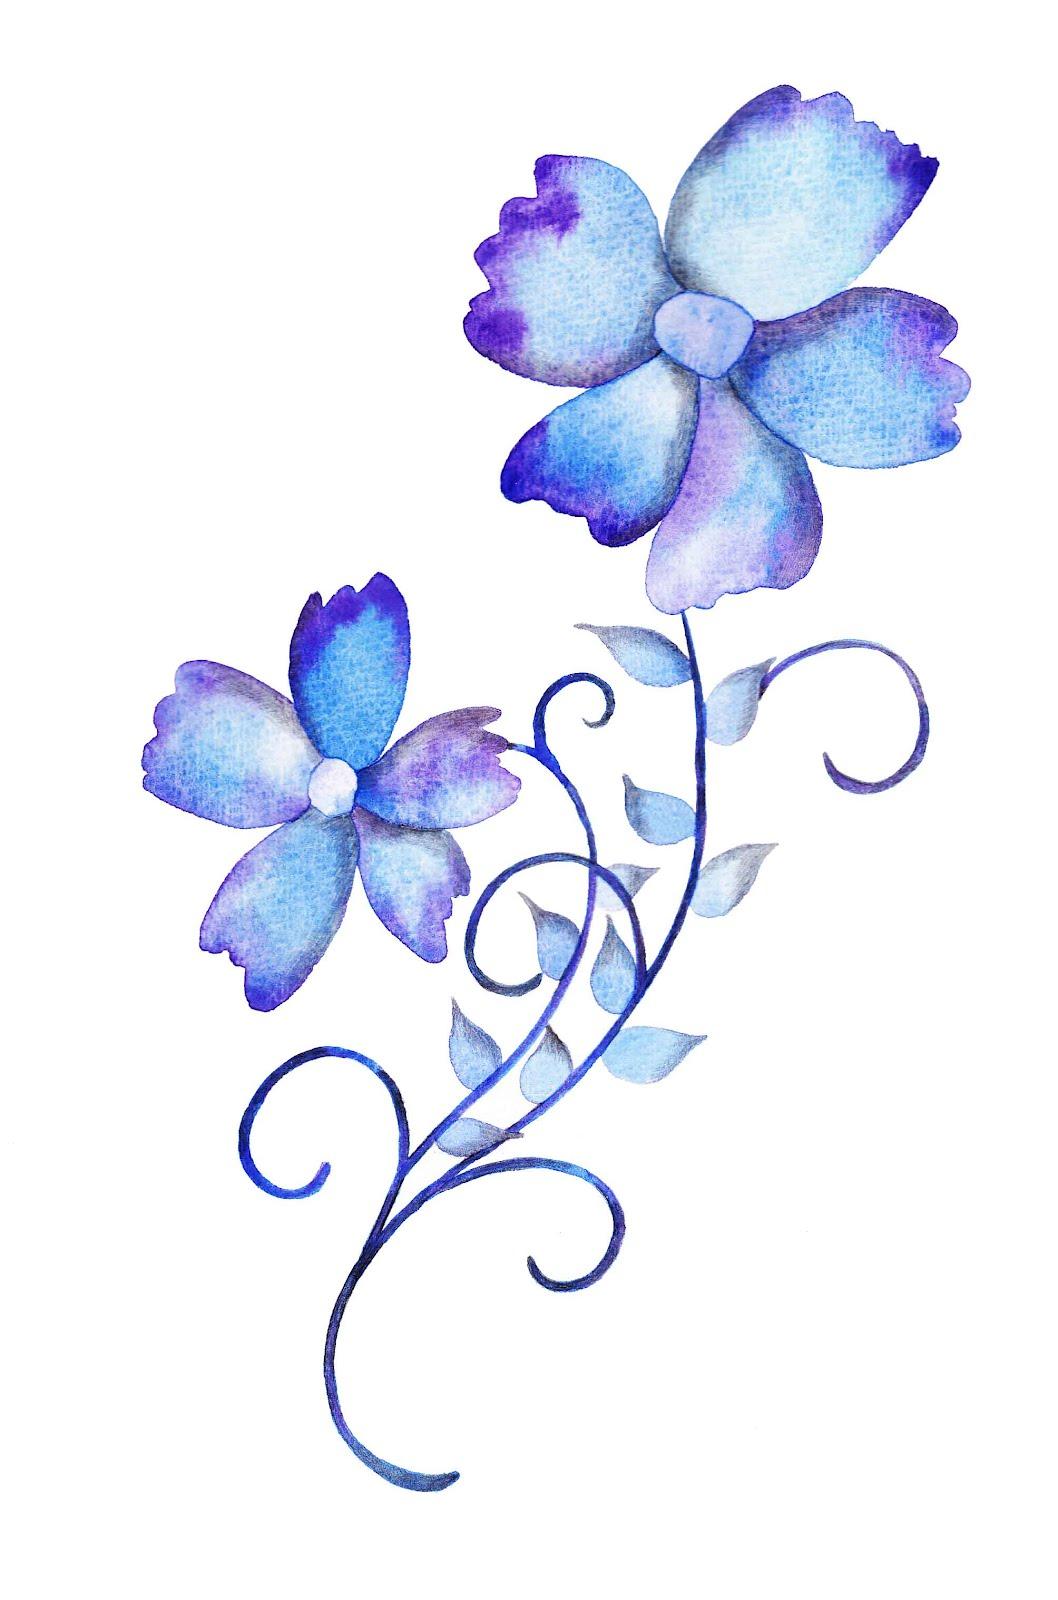 Spring Flower Texitle Design For Eyefix Part 2